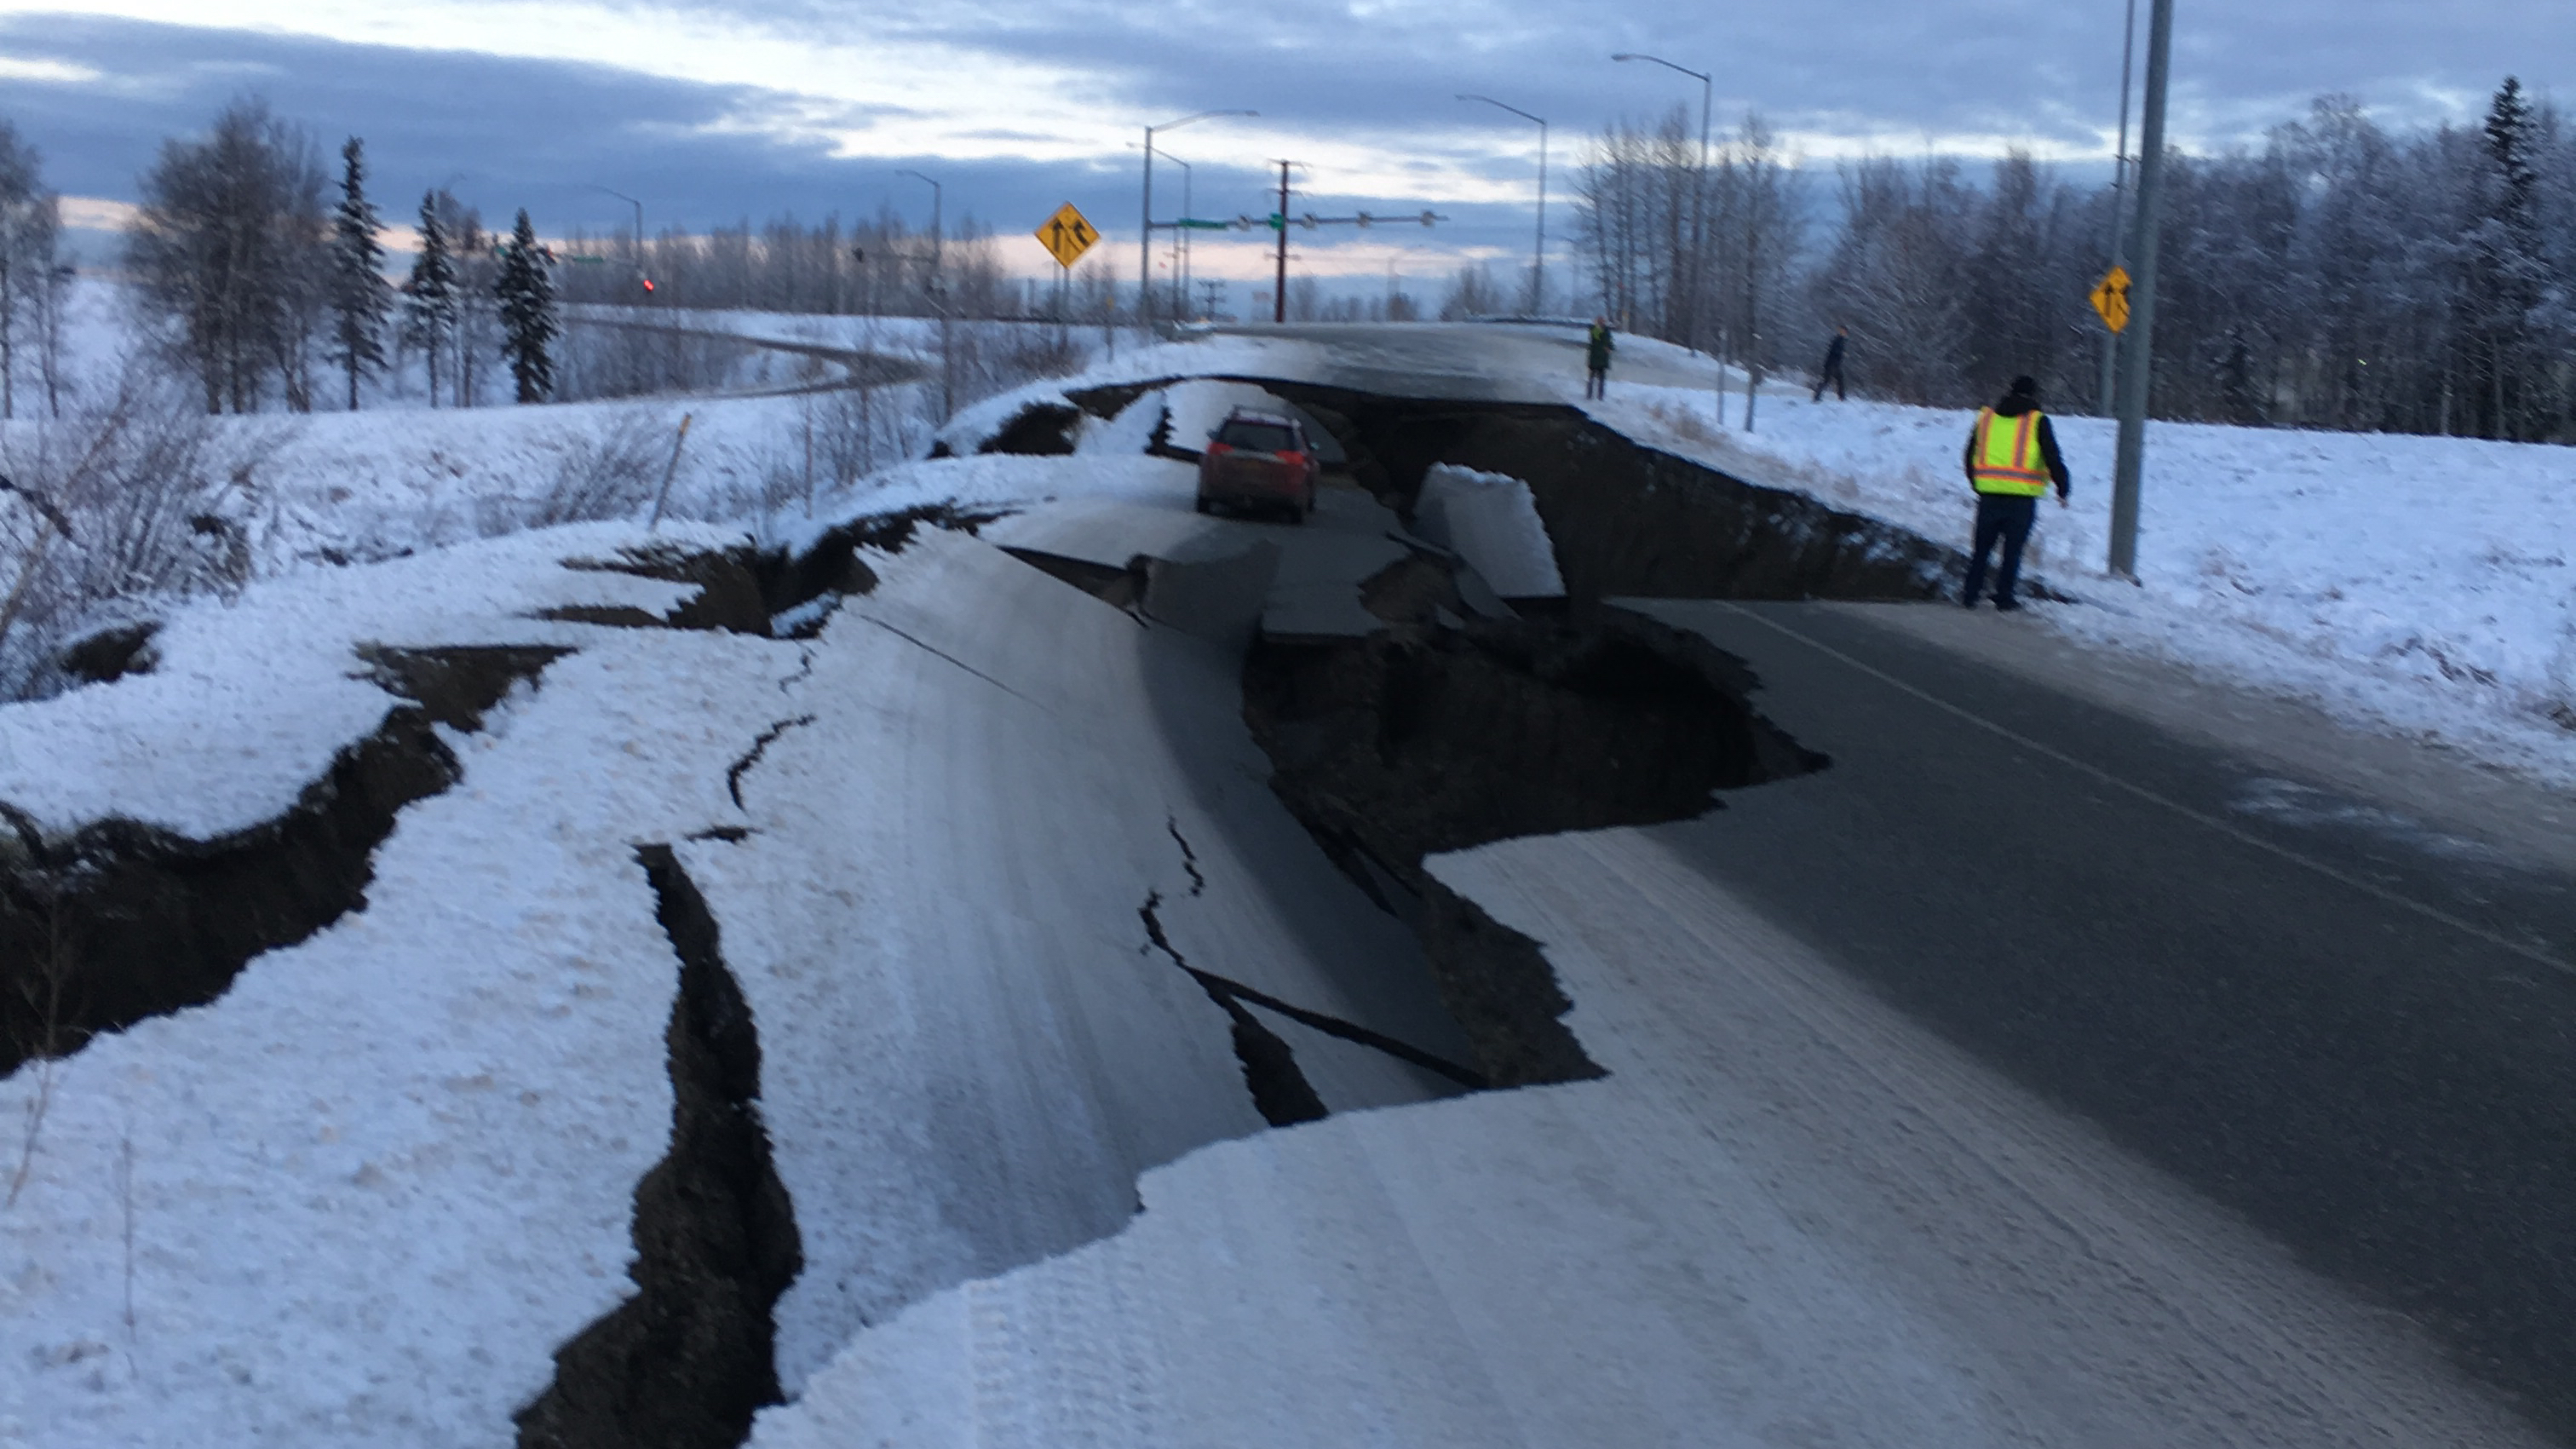 Magnitude 7.0 Earthquake Shakes Alaska, Damaging Roads, Buildings : NPR